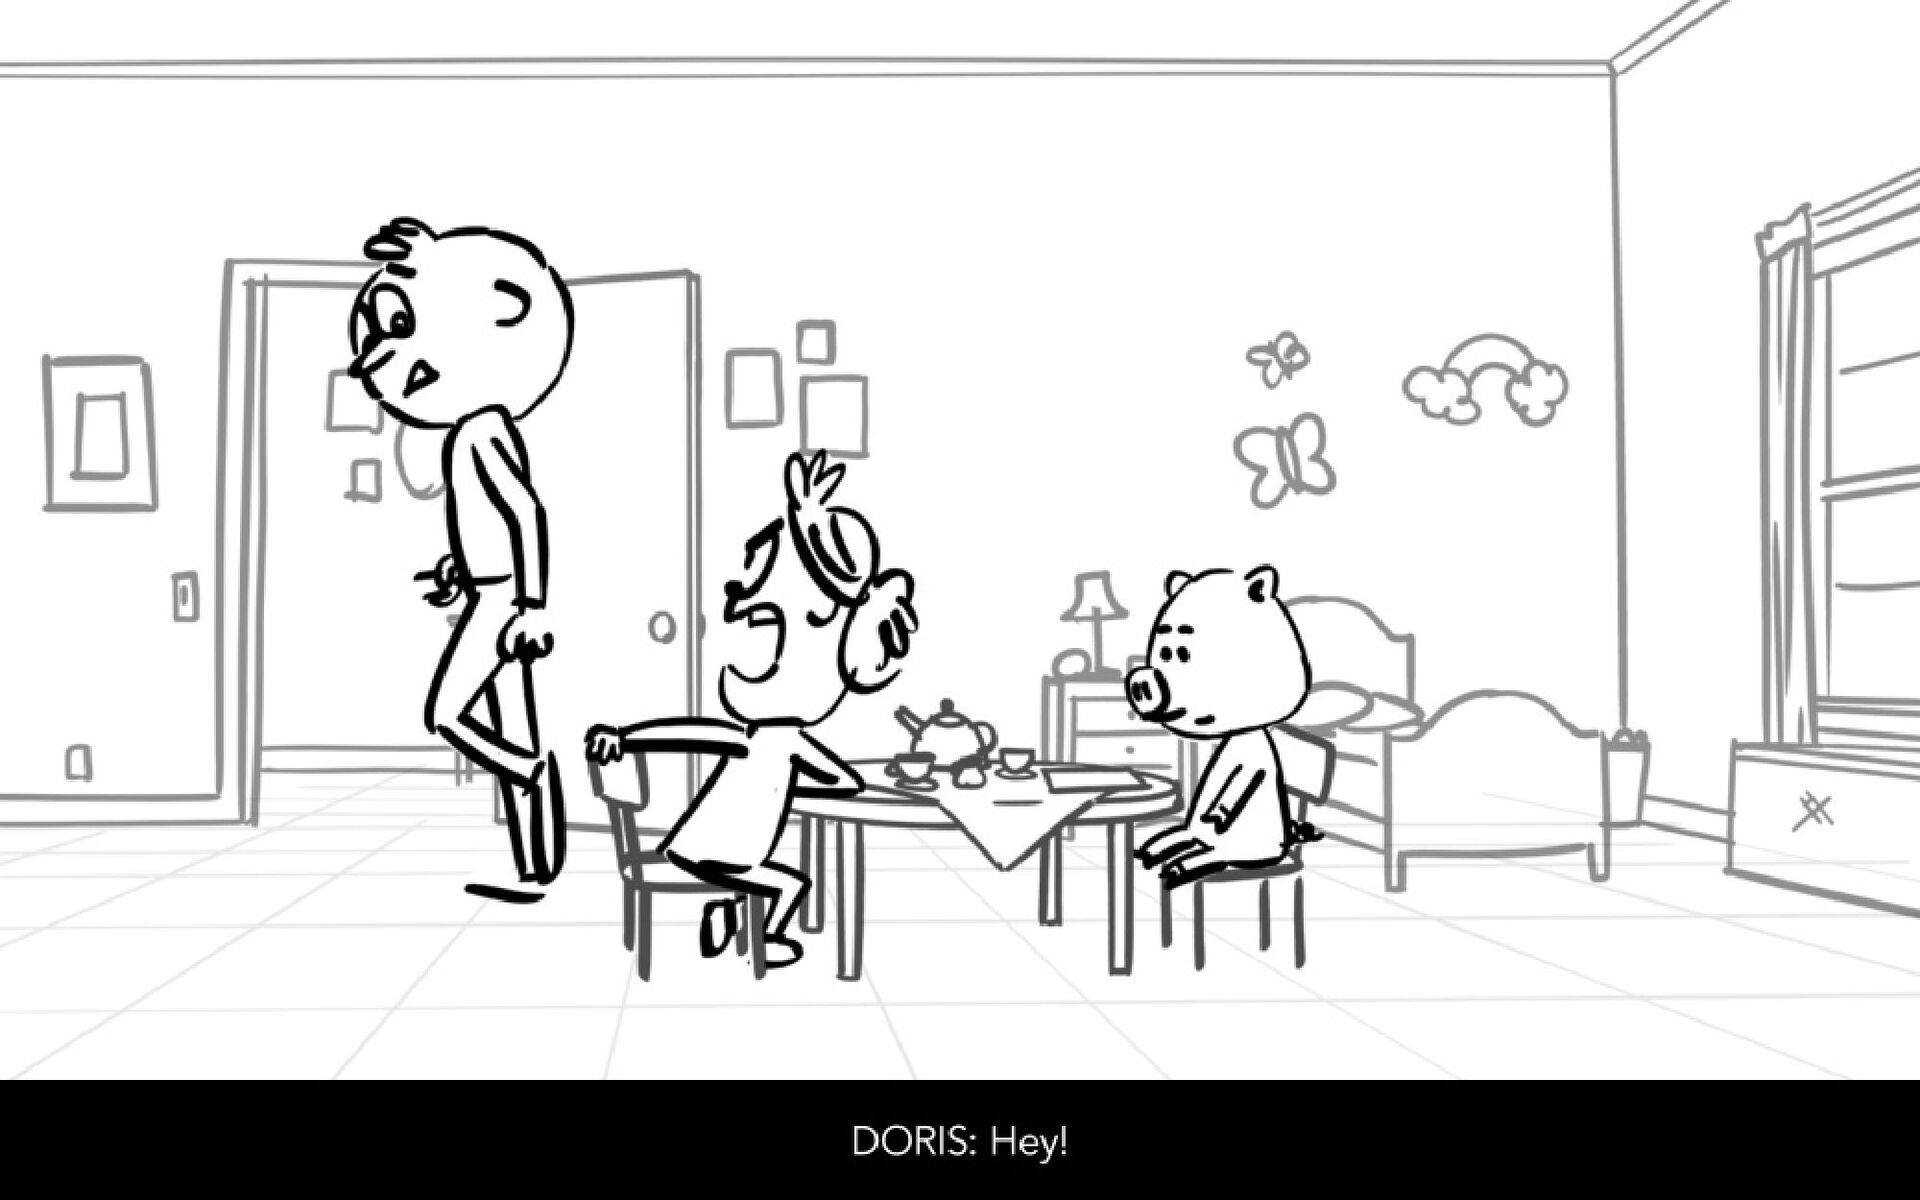 Dialog DORIS: Hey!